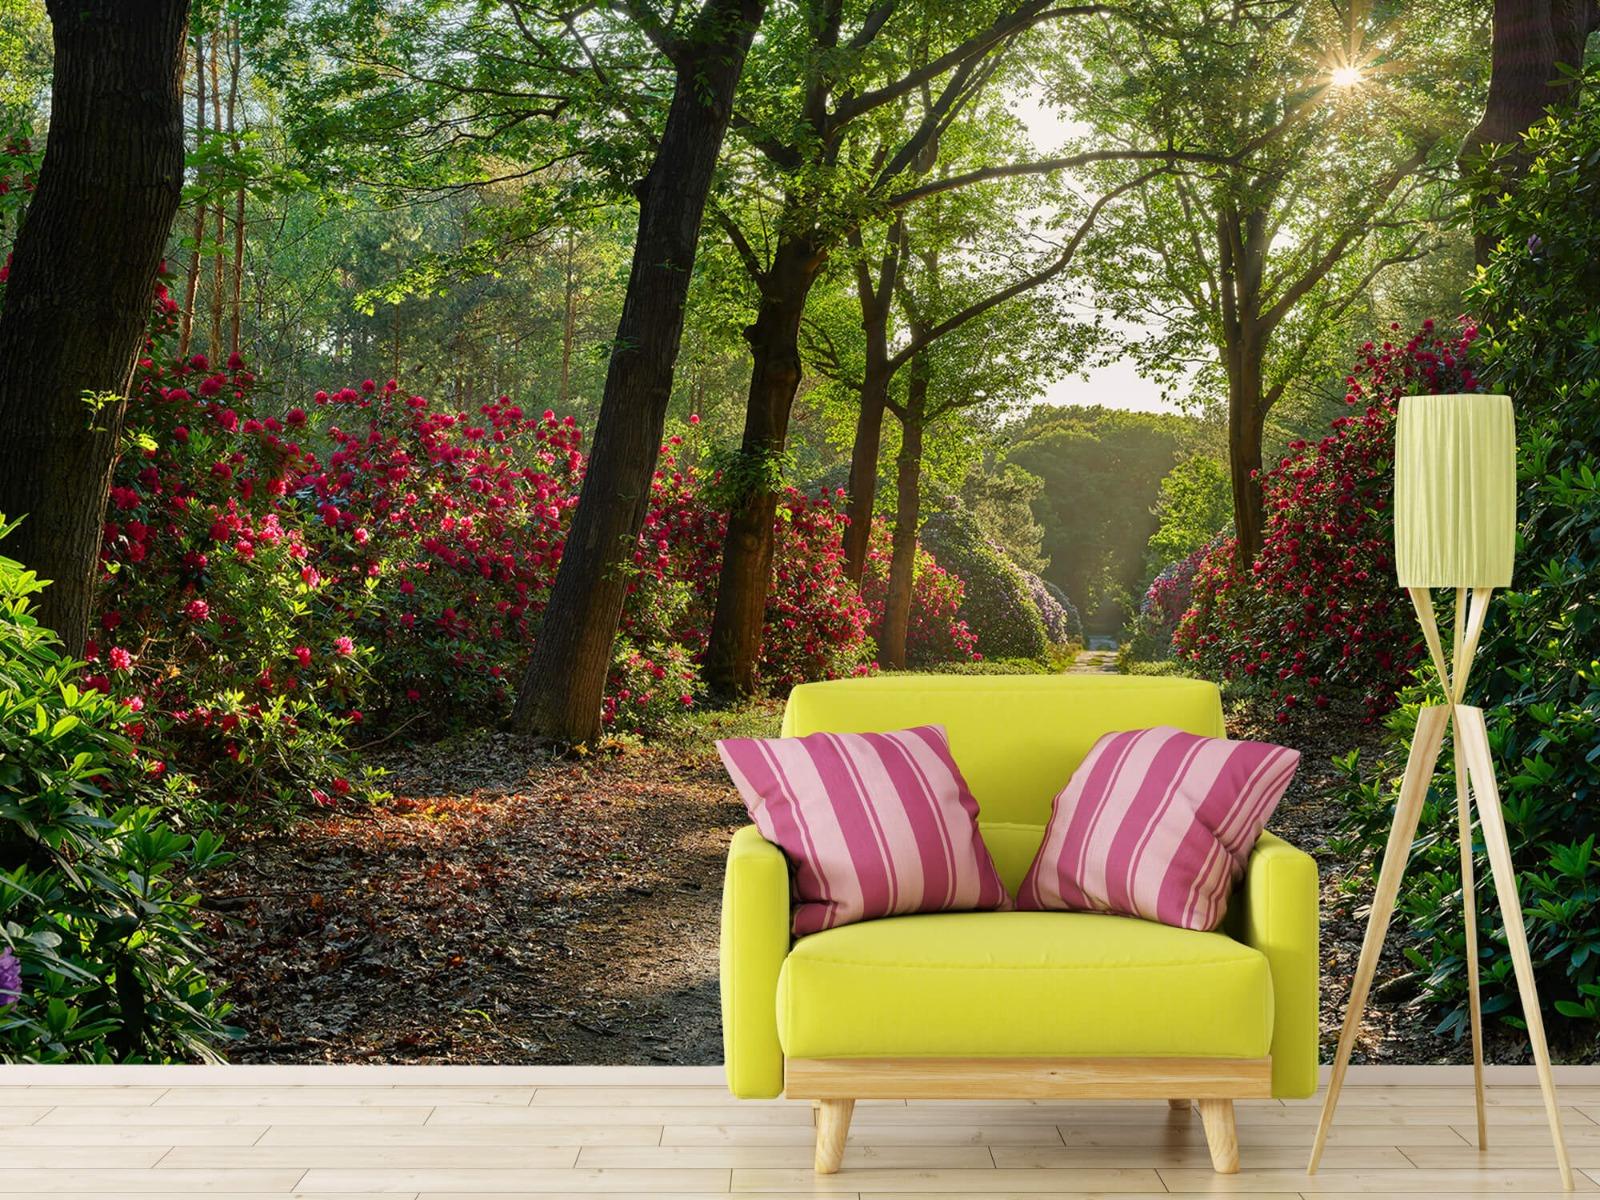 Bos - Zonsopkomst bij pad met rhododendrons 17